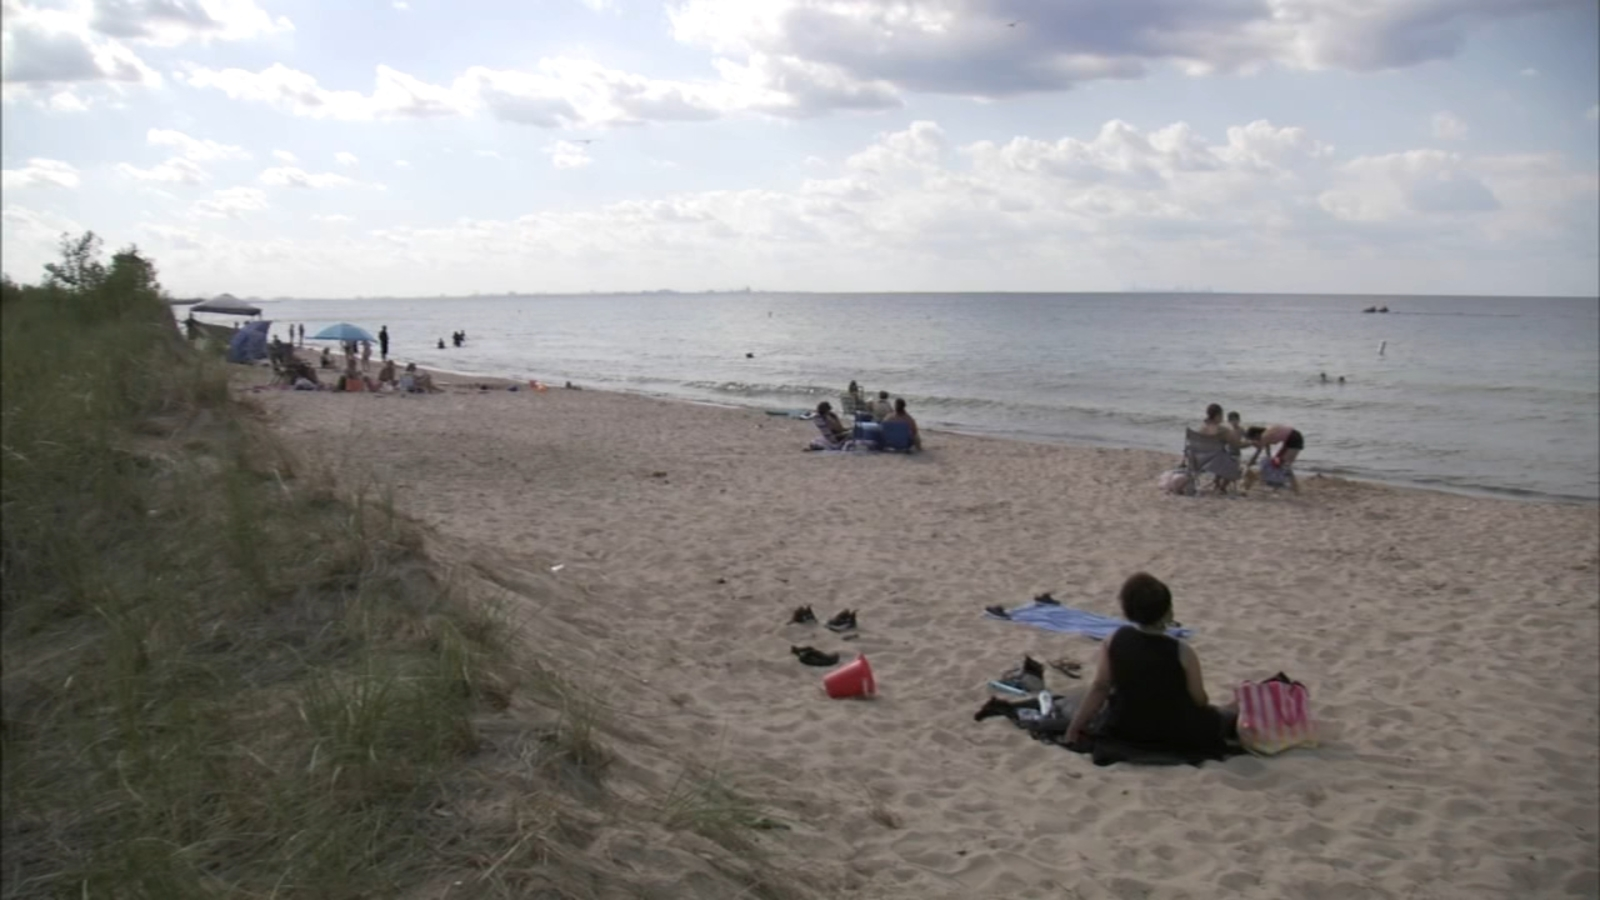 Mayor: Prospect for nude beach in Hammond a good old